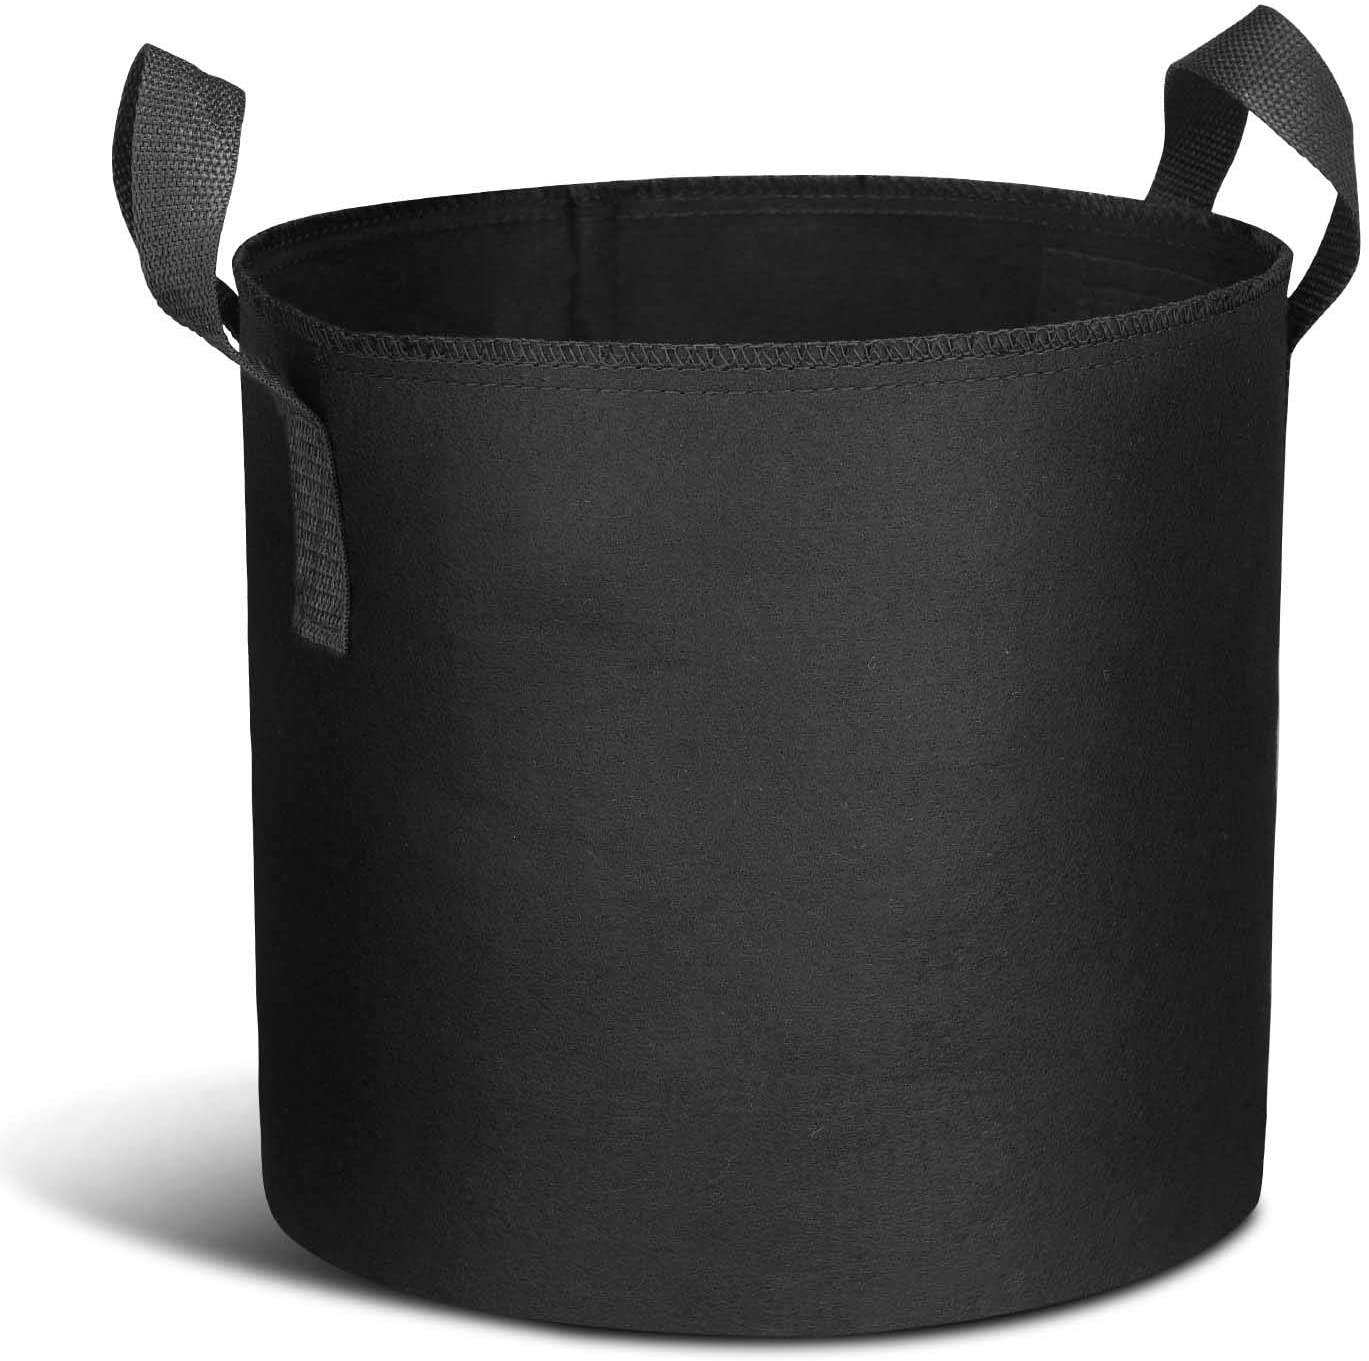 5 Gallon Fabric Pot for better soil aeration